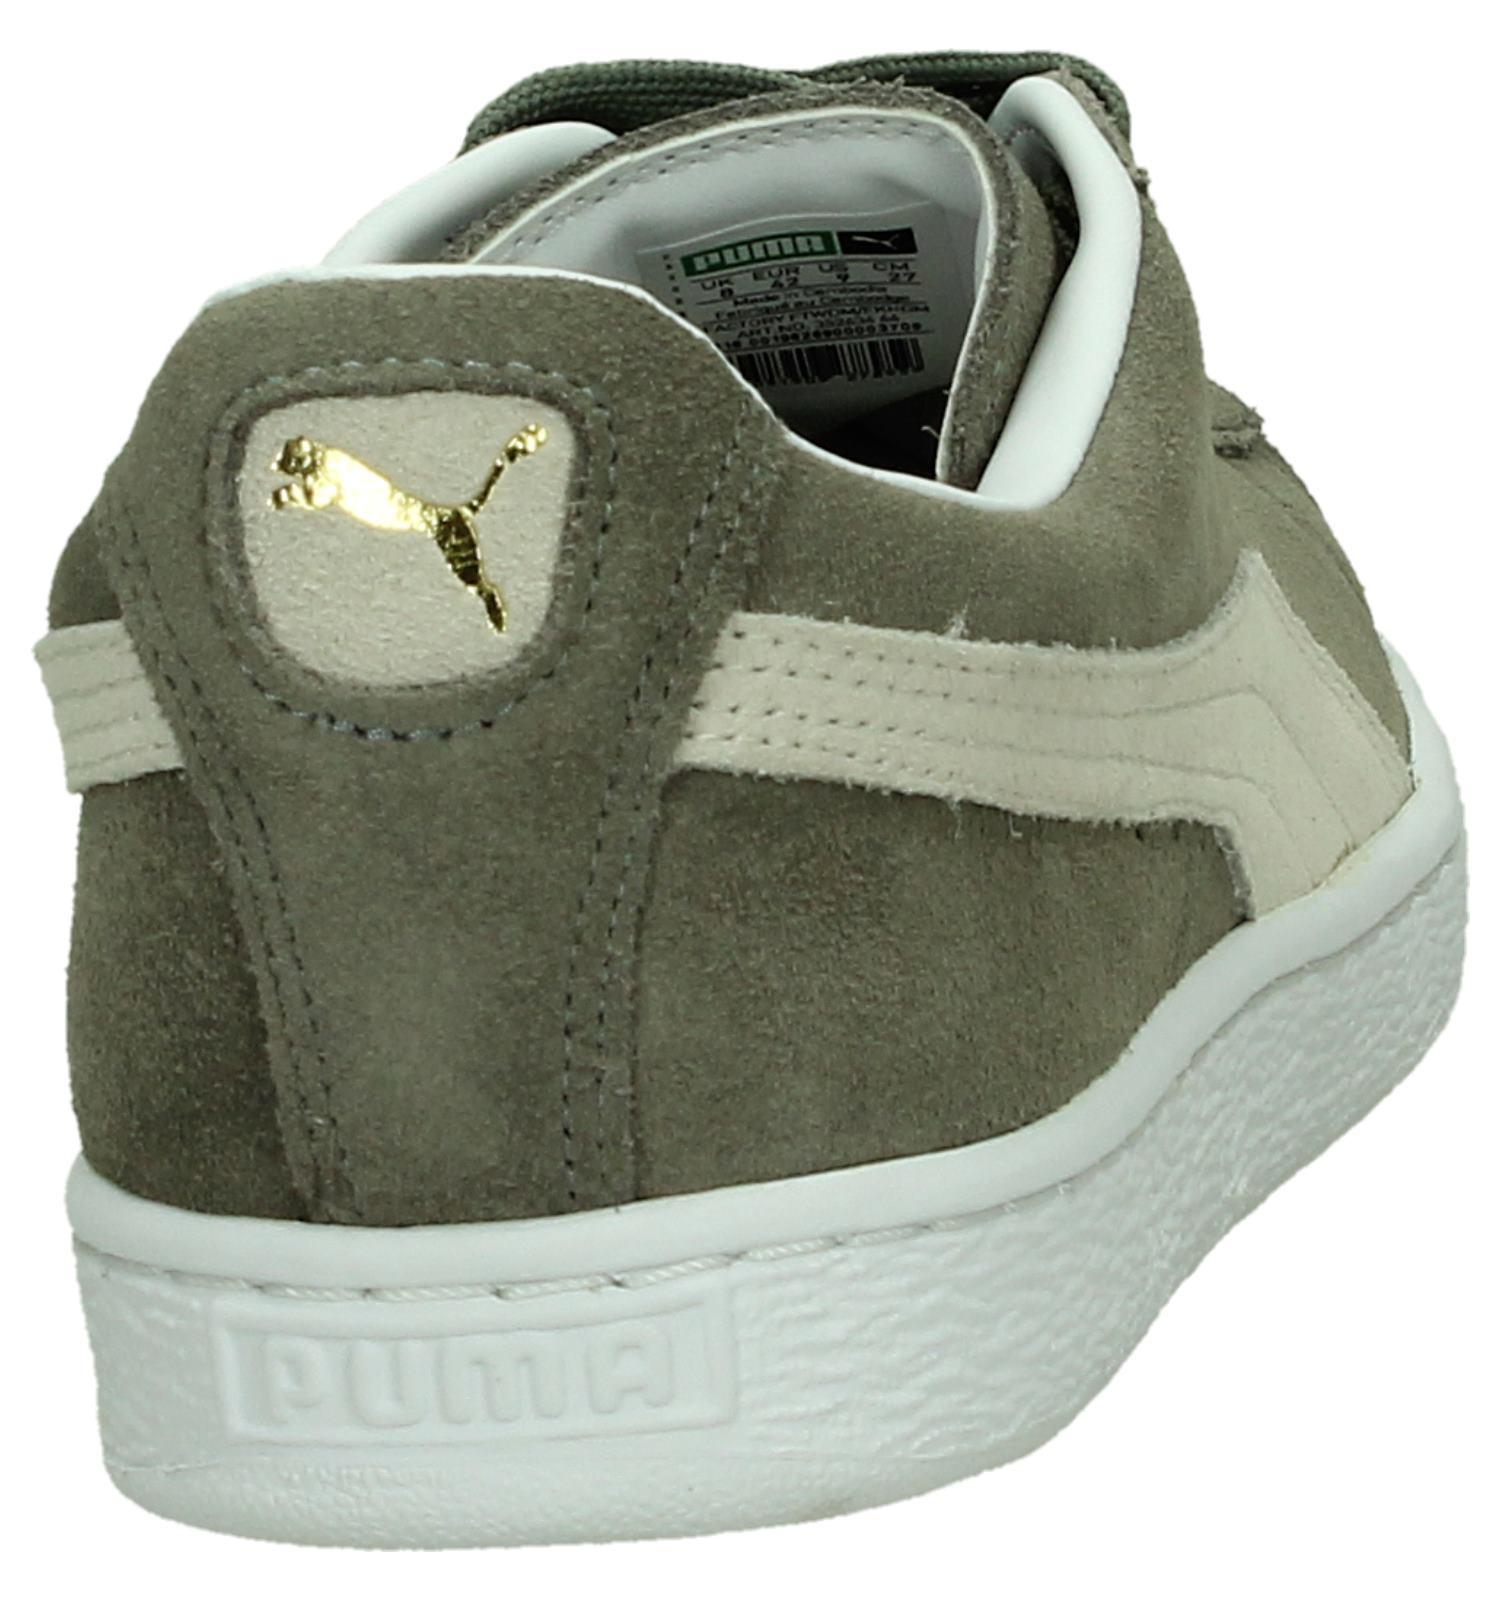 75d0f4f597a Grijze Sneakers Puma Suede Classic | TORFS.BE | Gratis verzend en retour